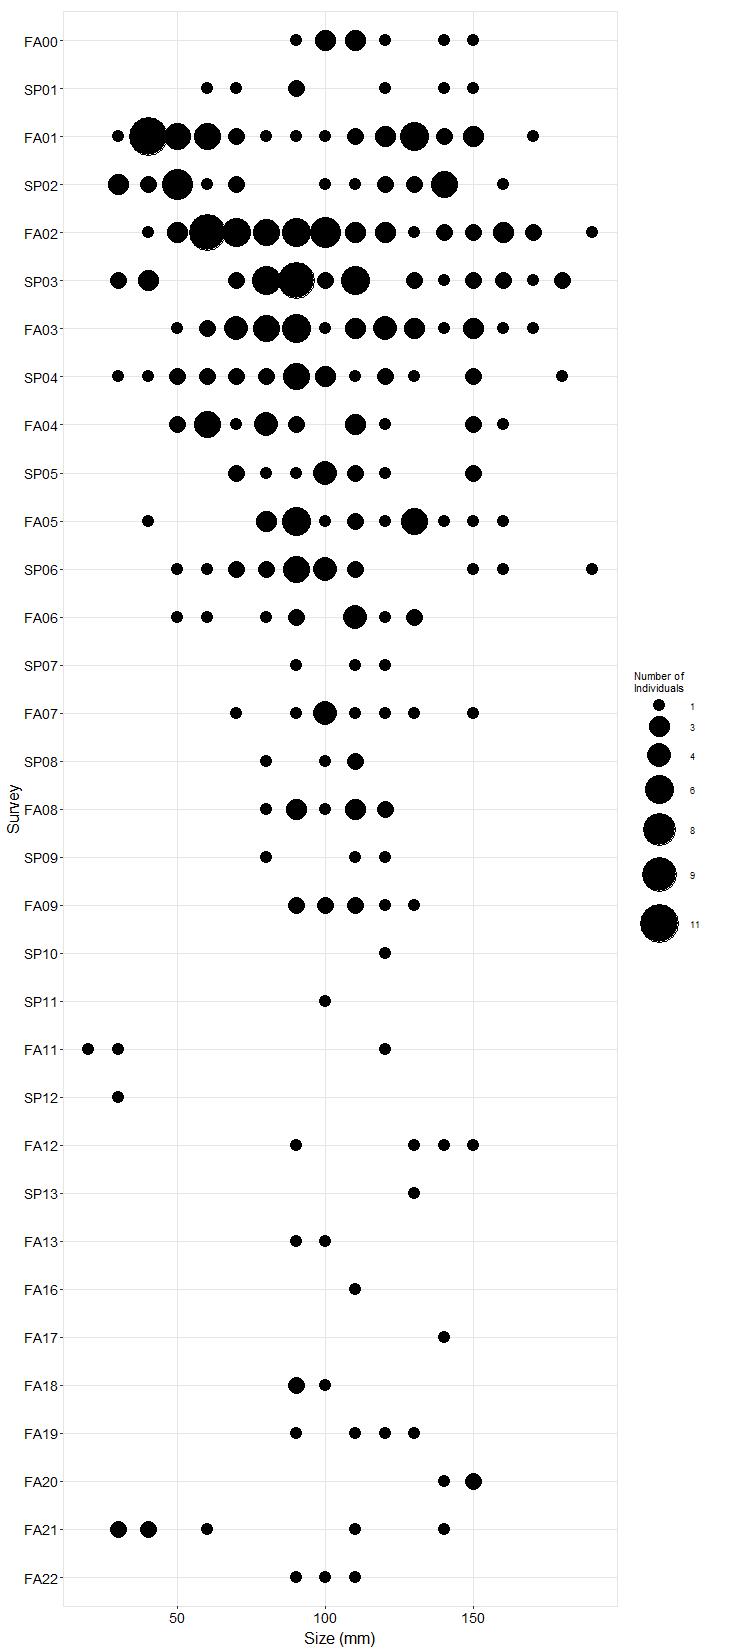 Arroyo Hondo Pisaster size plot